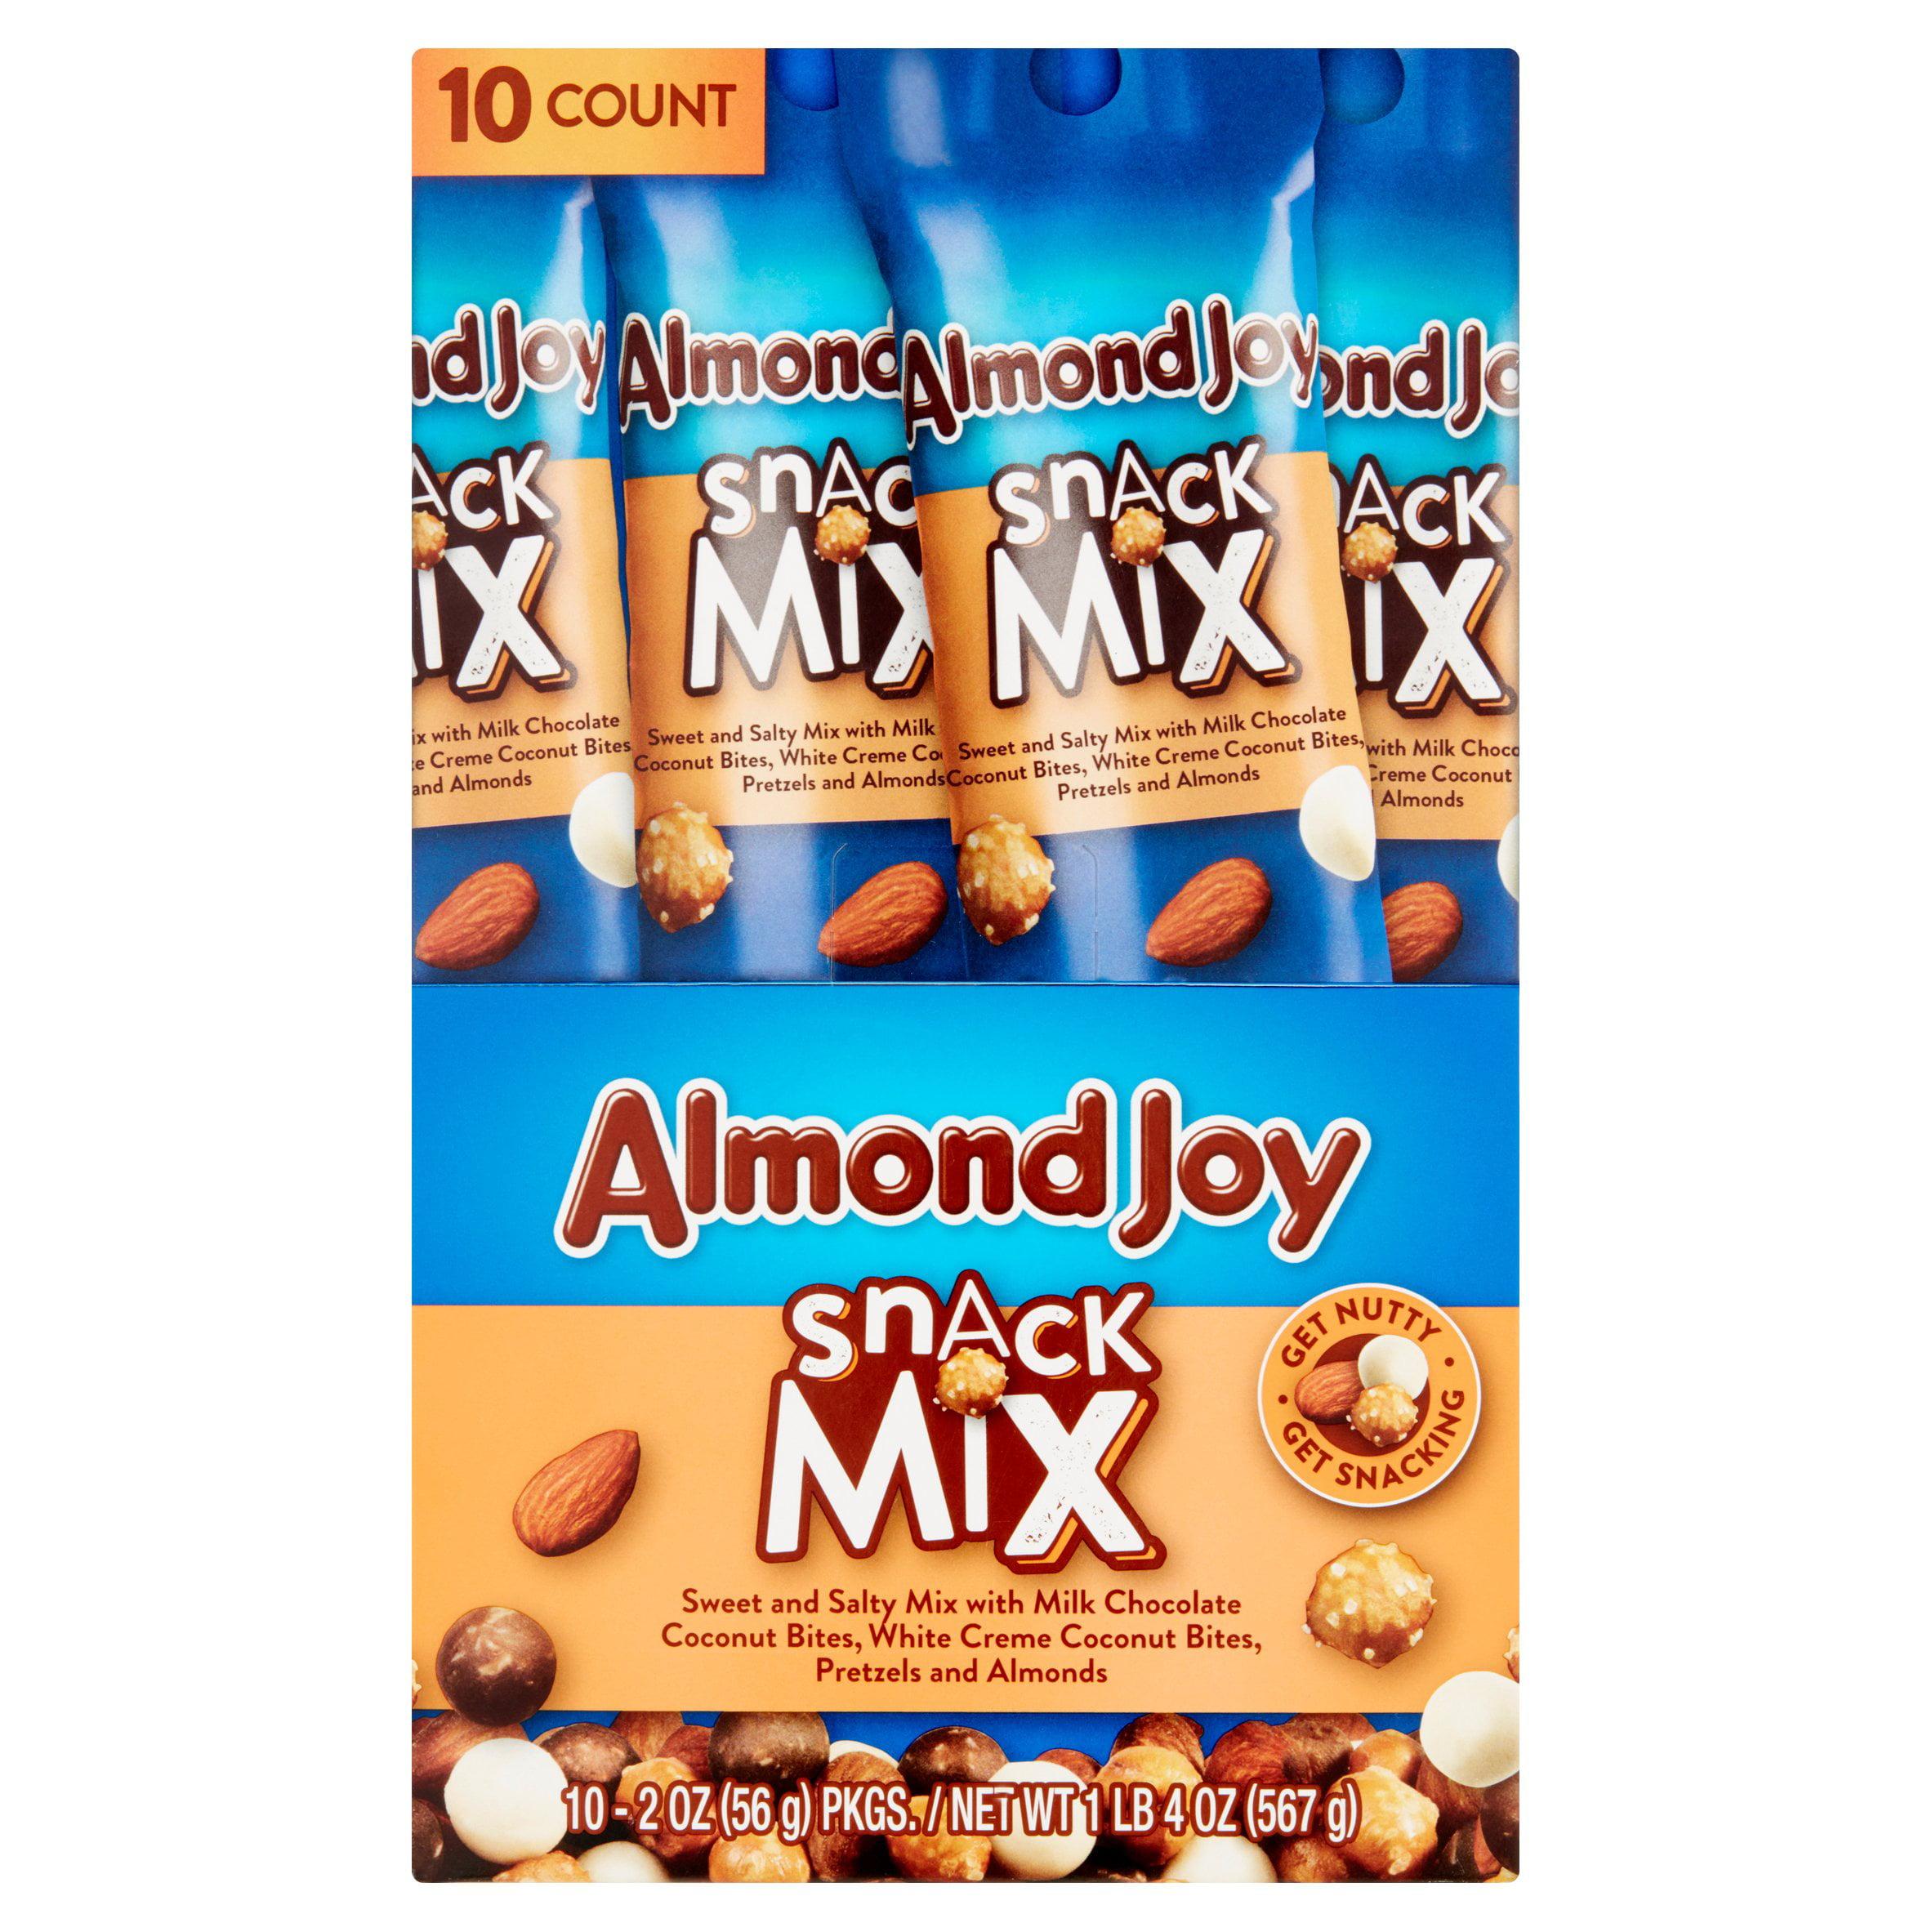 Almond Joy Snack Mix, 2 Oz, 10 Ct